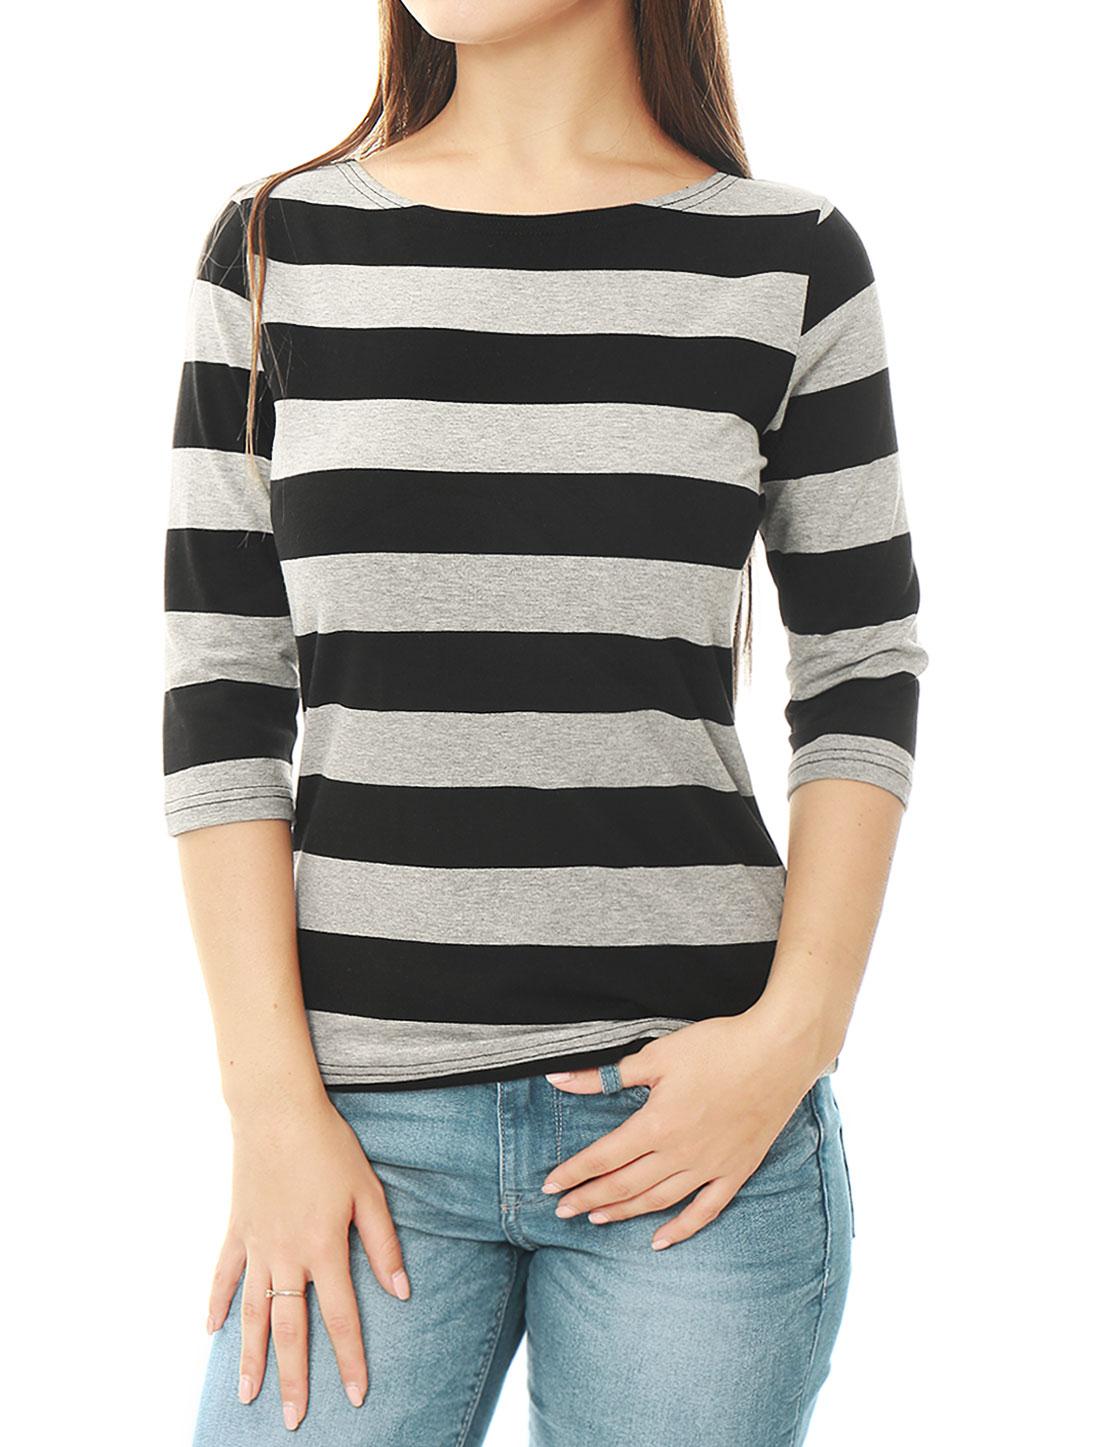 Women Elbow Sleeves Boat Neck Slim Fit Striped Tee Black Gray L